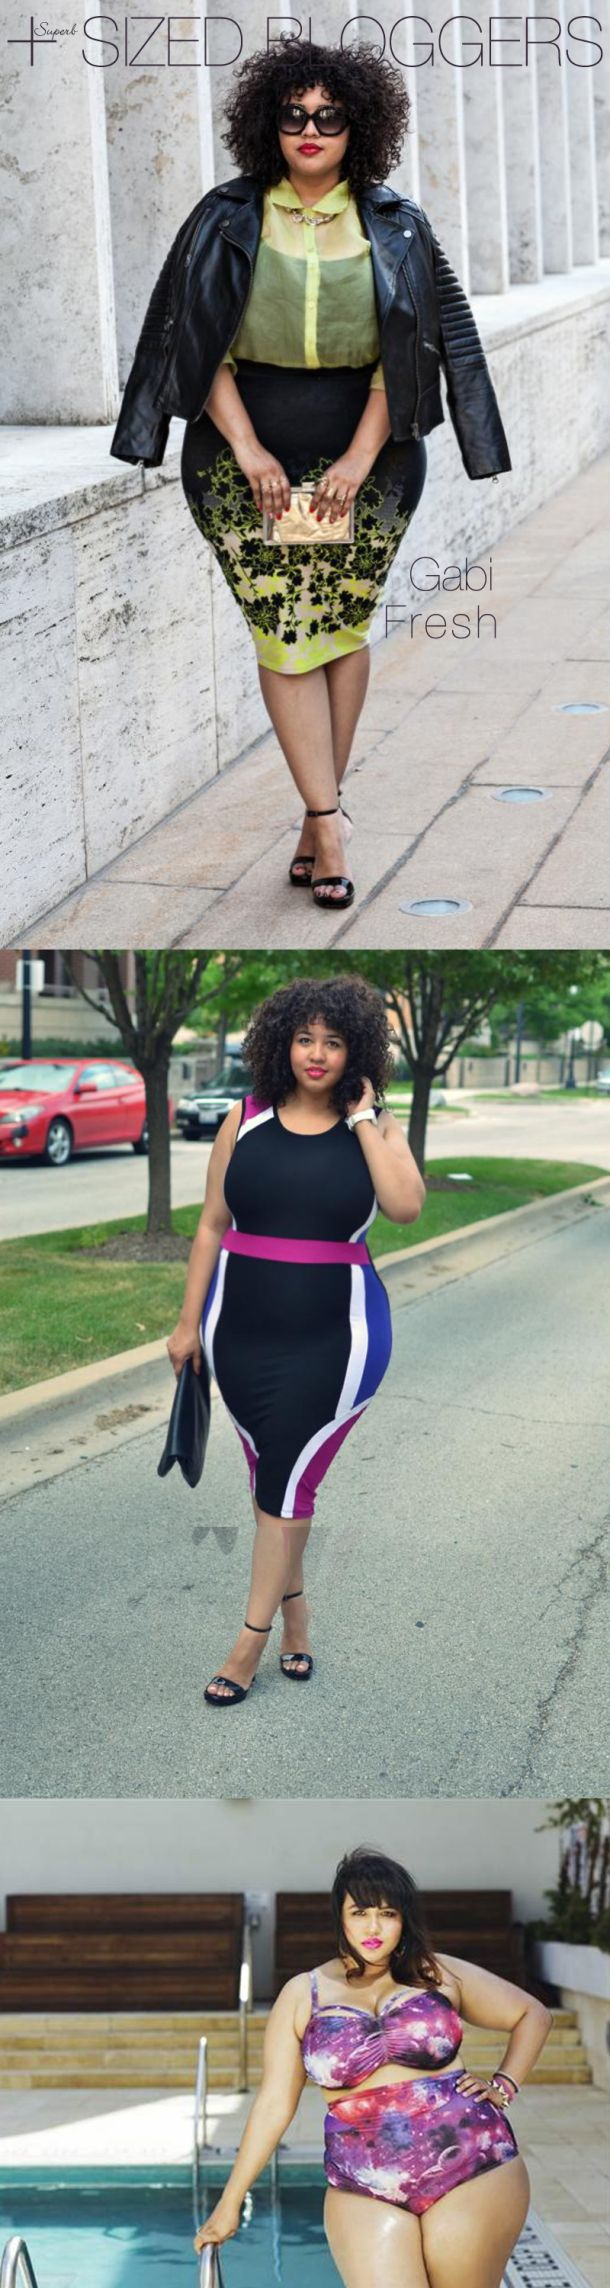 gabi-fresh best plus sized fashion bloggers.... plus size fashion does not have to be boring !!